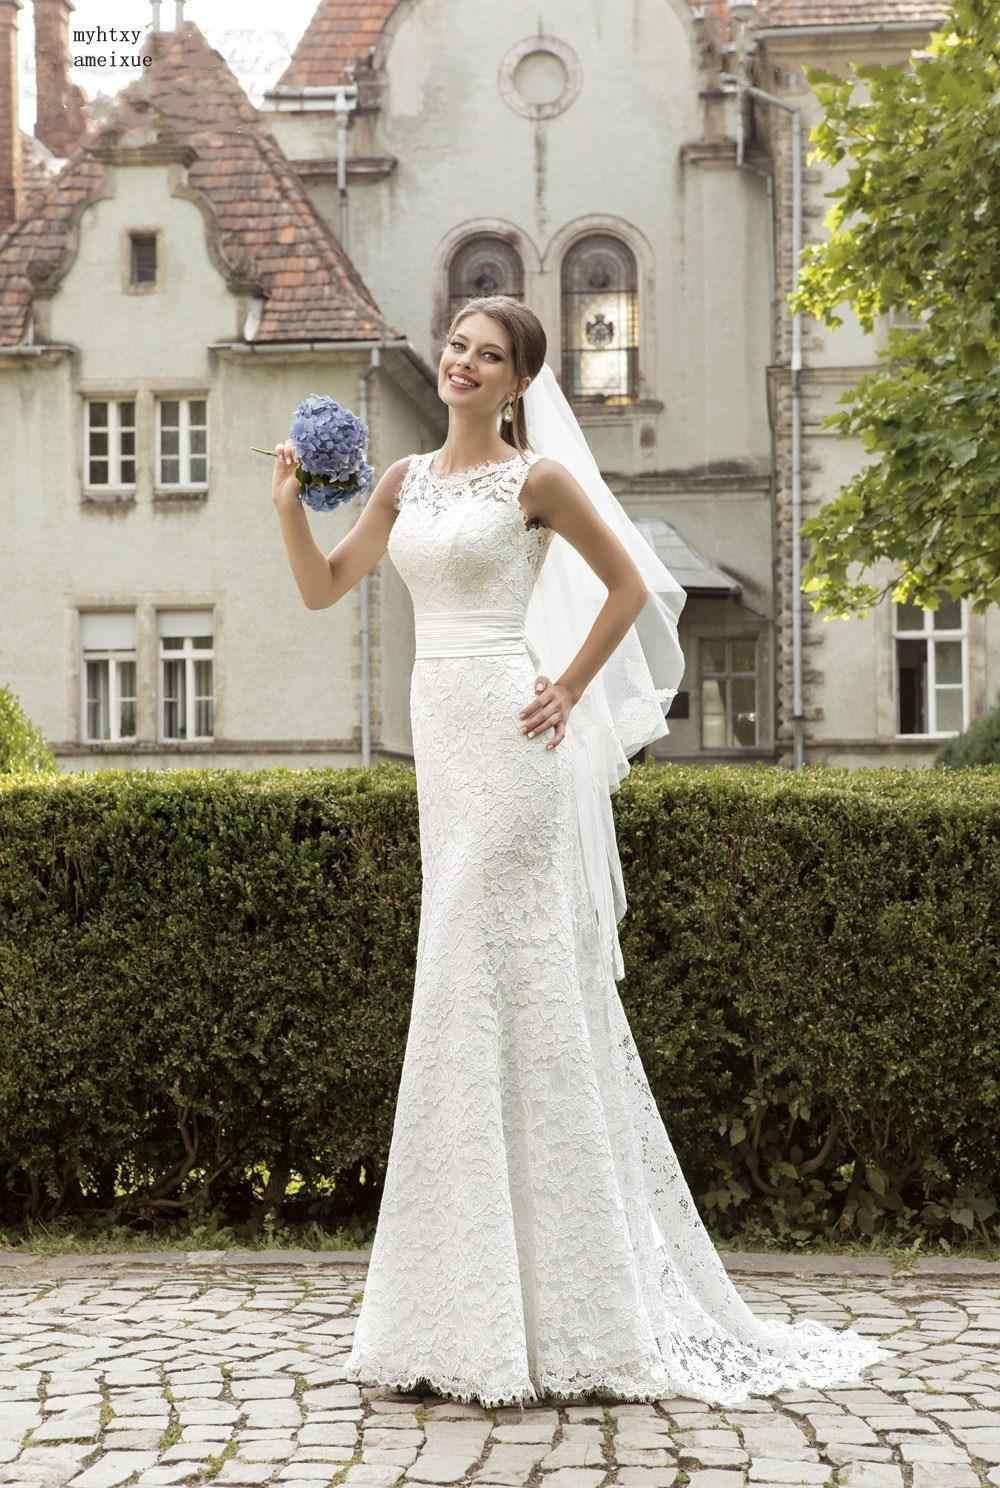 Fashion Lace Mermaid Backless Wedding Dress 2020 Sleeveless Sash Scoop Bride Gown Romantic Court Train Ribbon Tank Wedding Gown Aliexpress,Summer Elegant Pakistani Wedding Guest Dresses